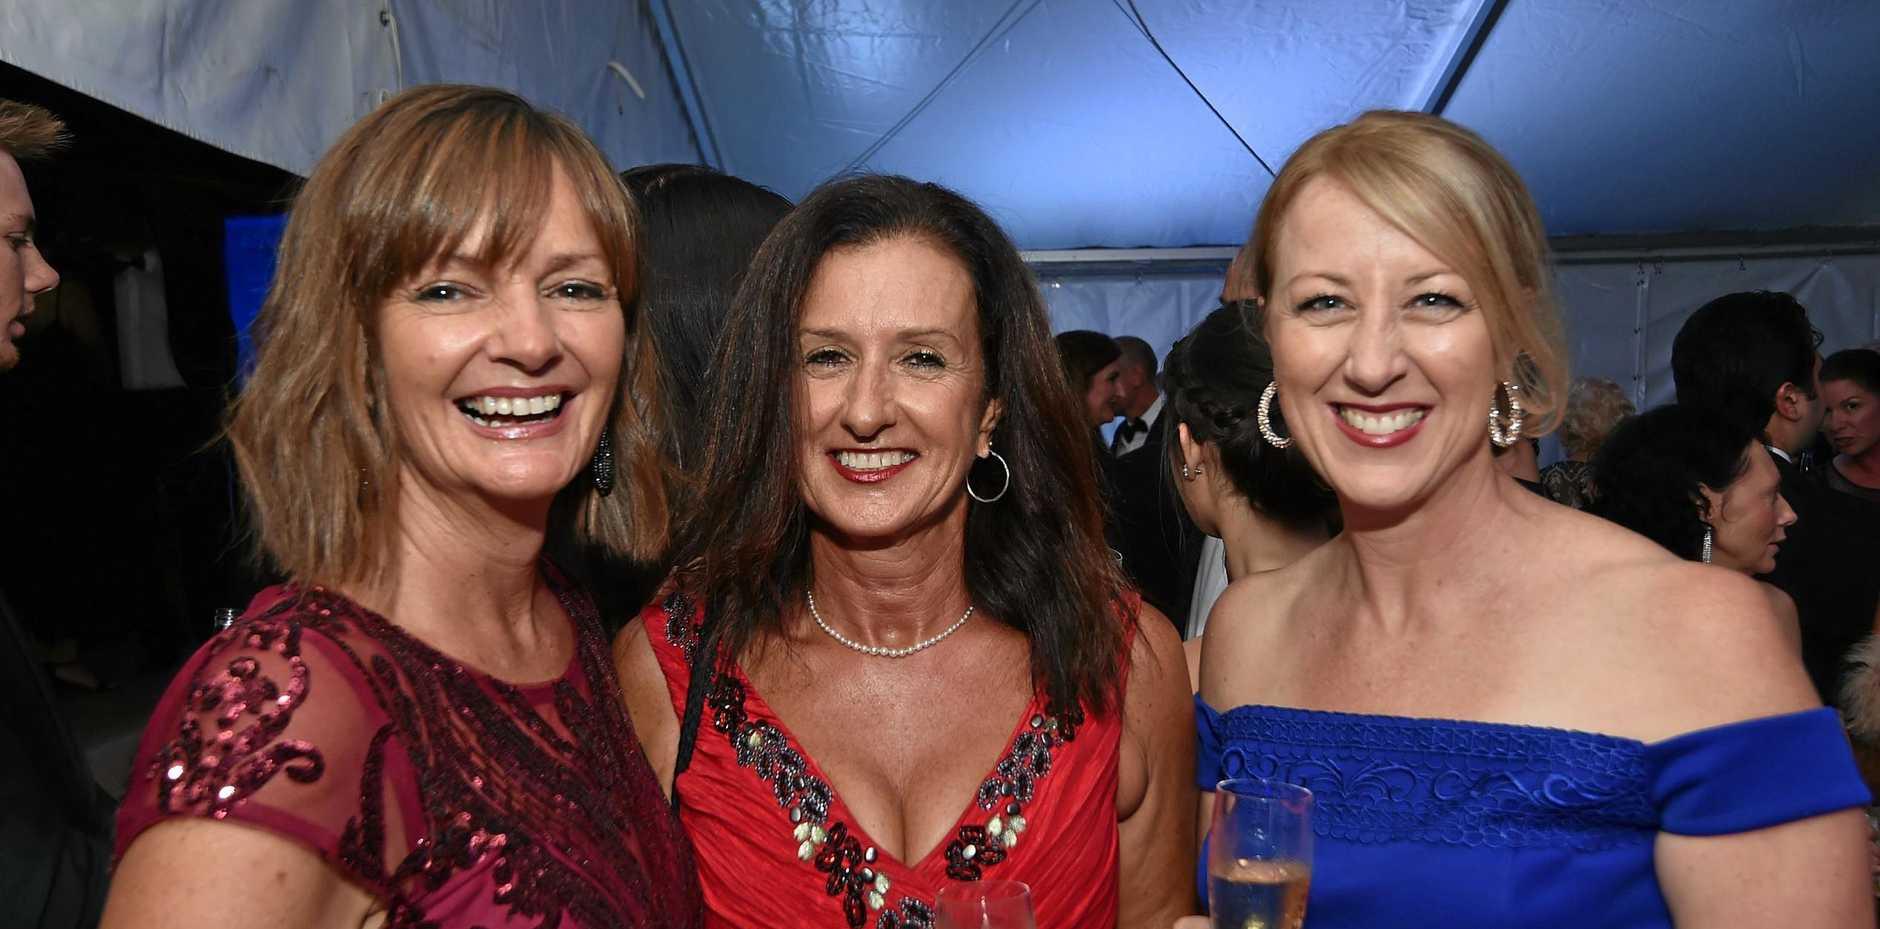 Michelle De Boer, Jina Lynch and Anna Michell.